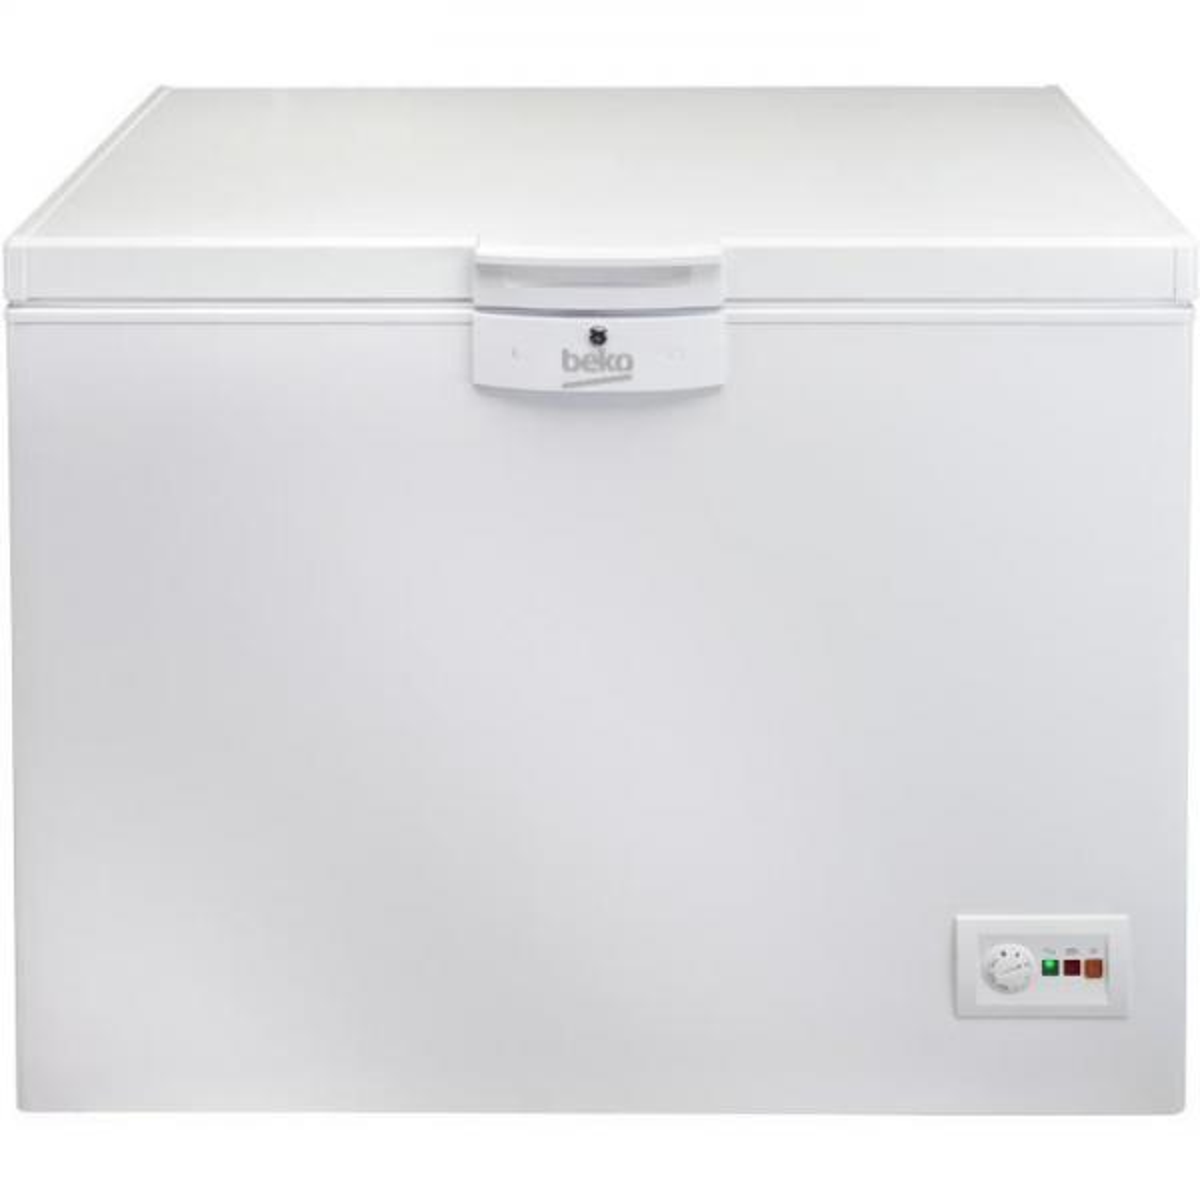 Beko - Congélateur coffre 298L Froid Low Frost BEKO 110.5cm F, BEK5944008924157